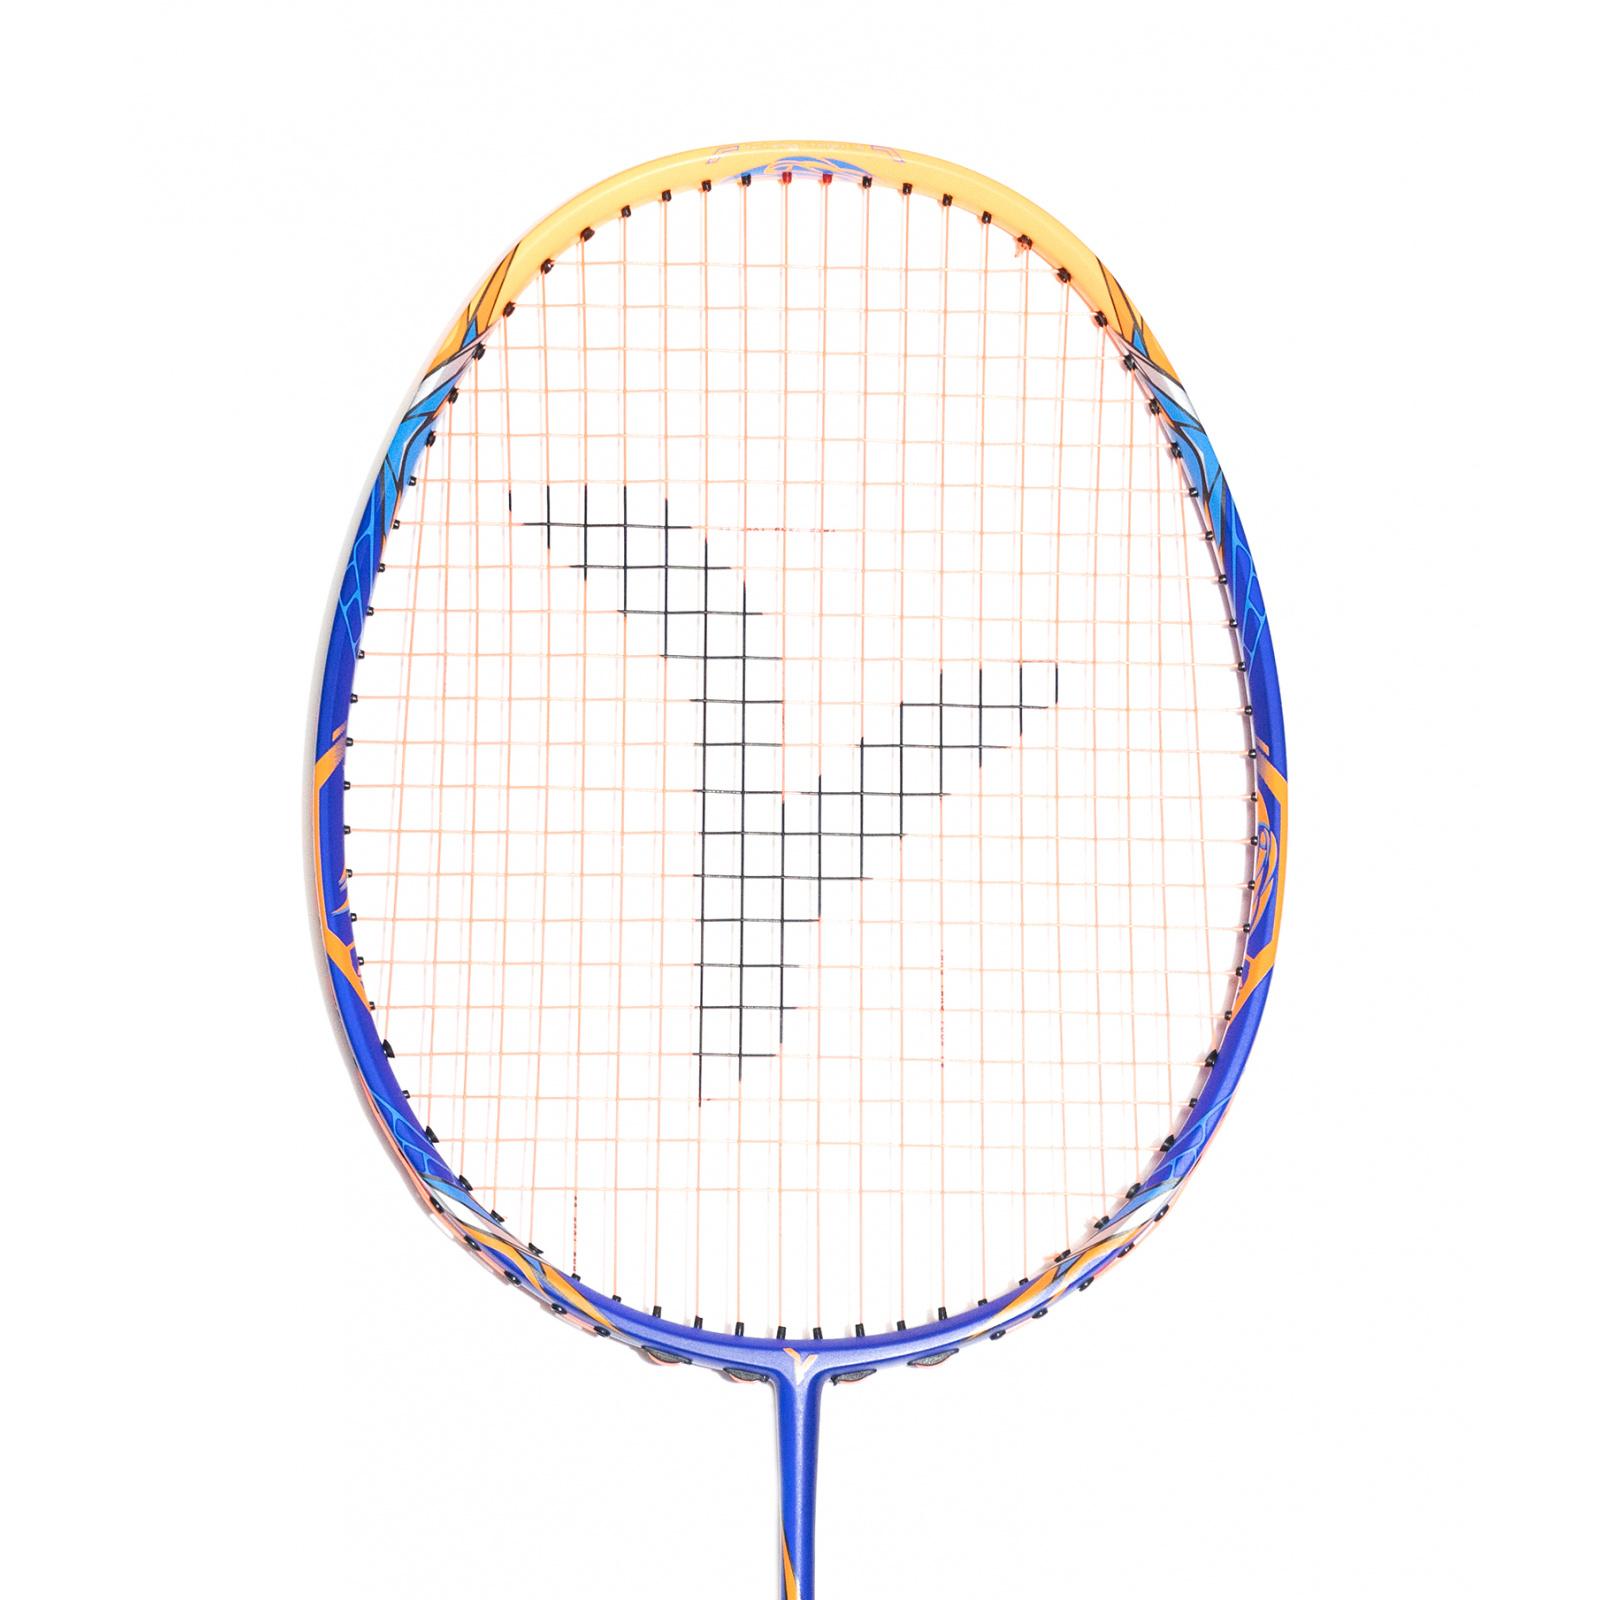 https://www.badec.store/produkty_img/badmintonova-raketa1601214310L.jpg